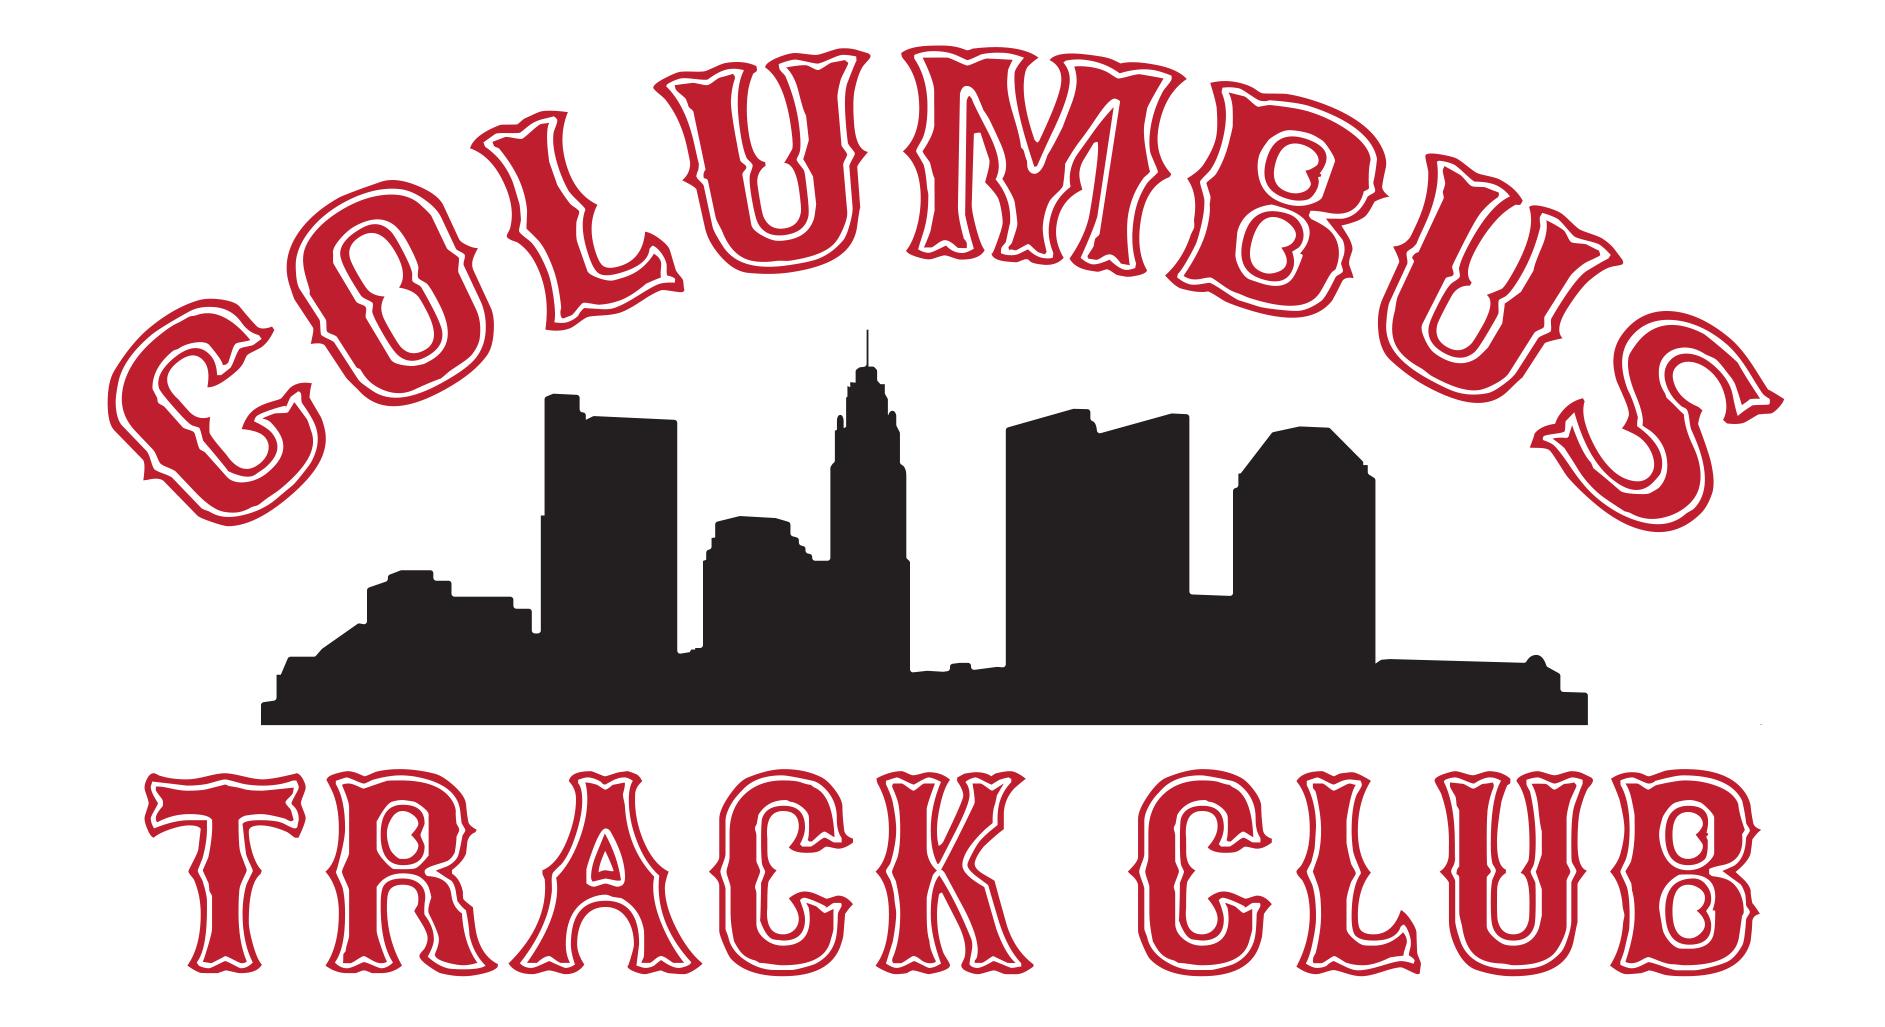 Fleet Feet Columbus Track Club